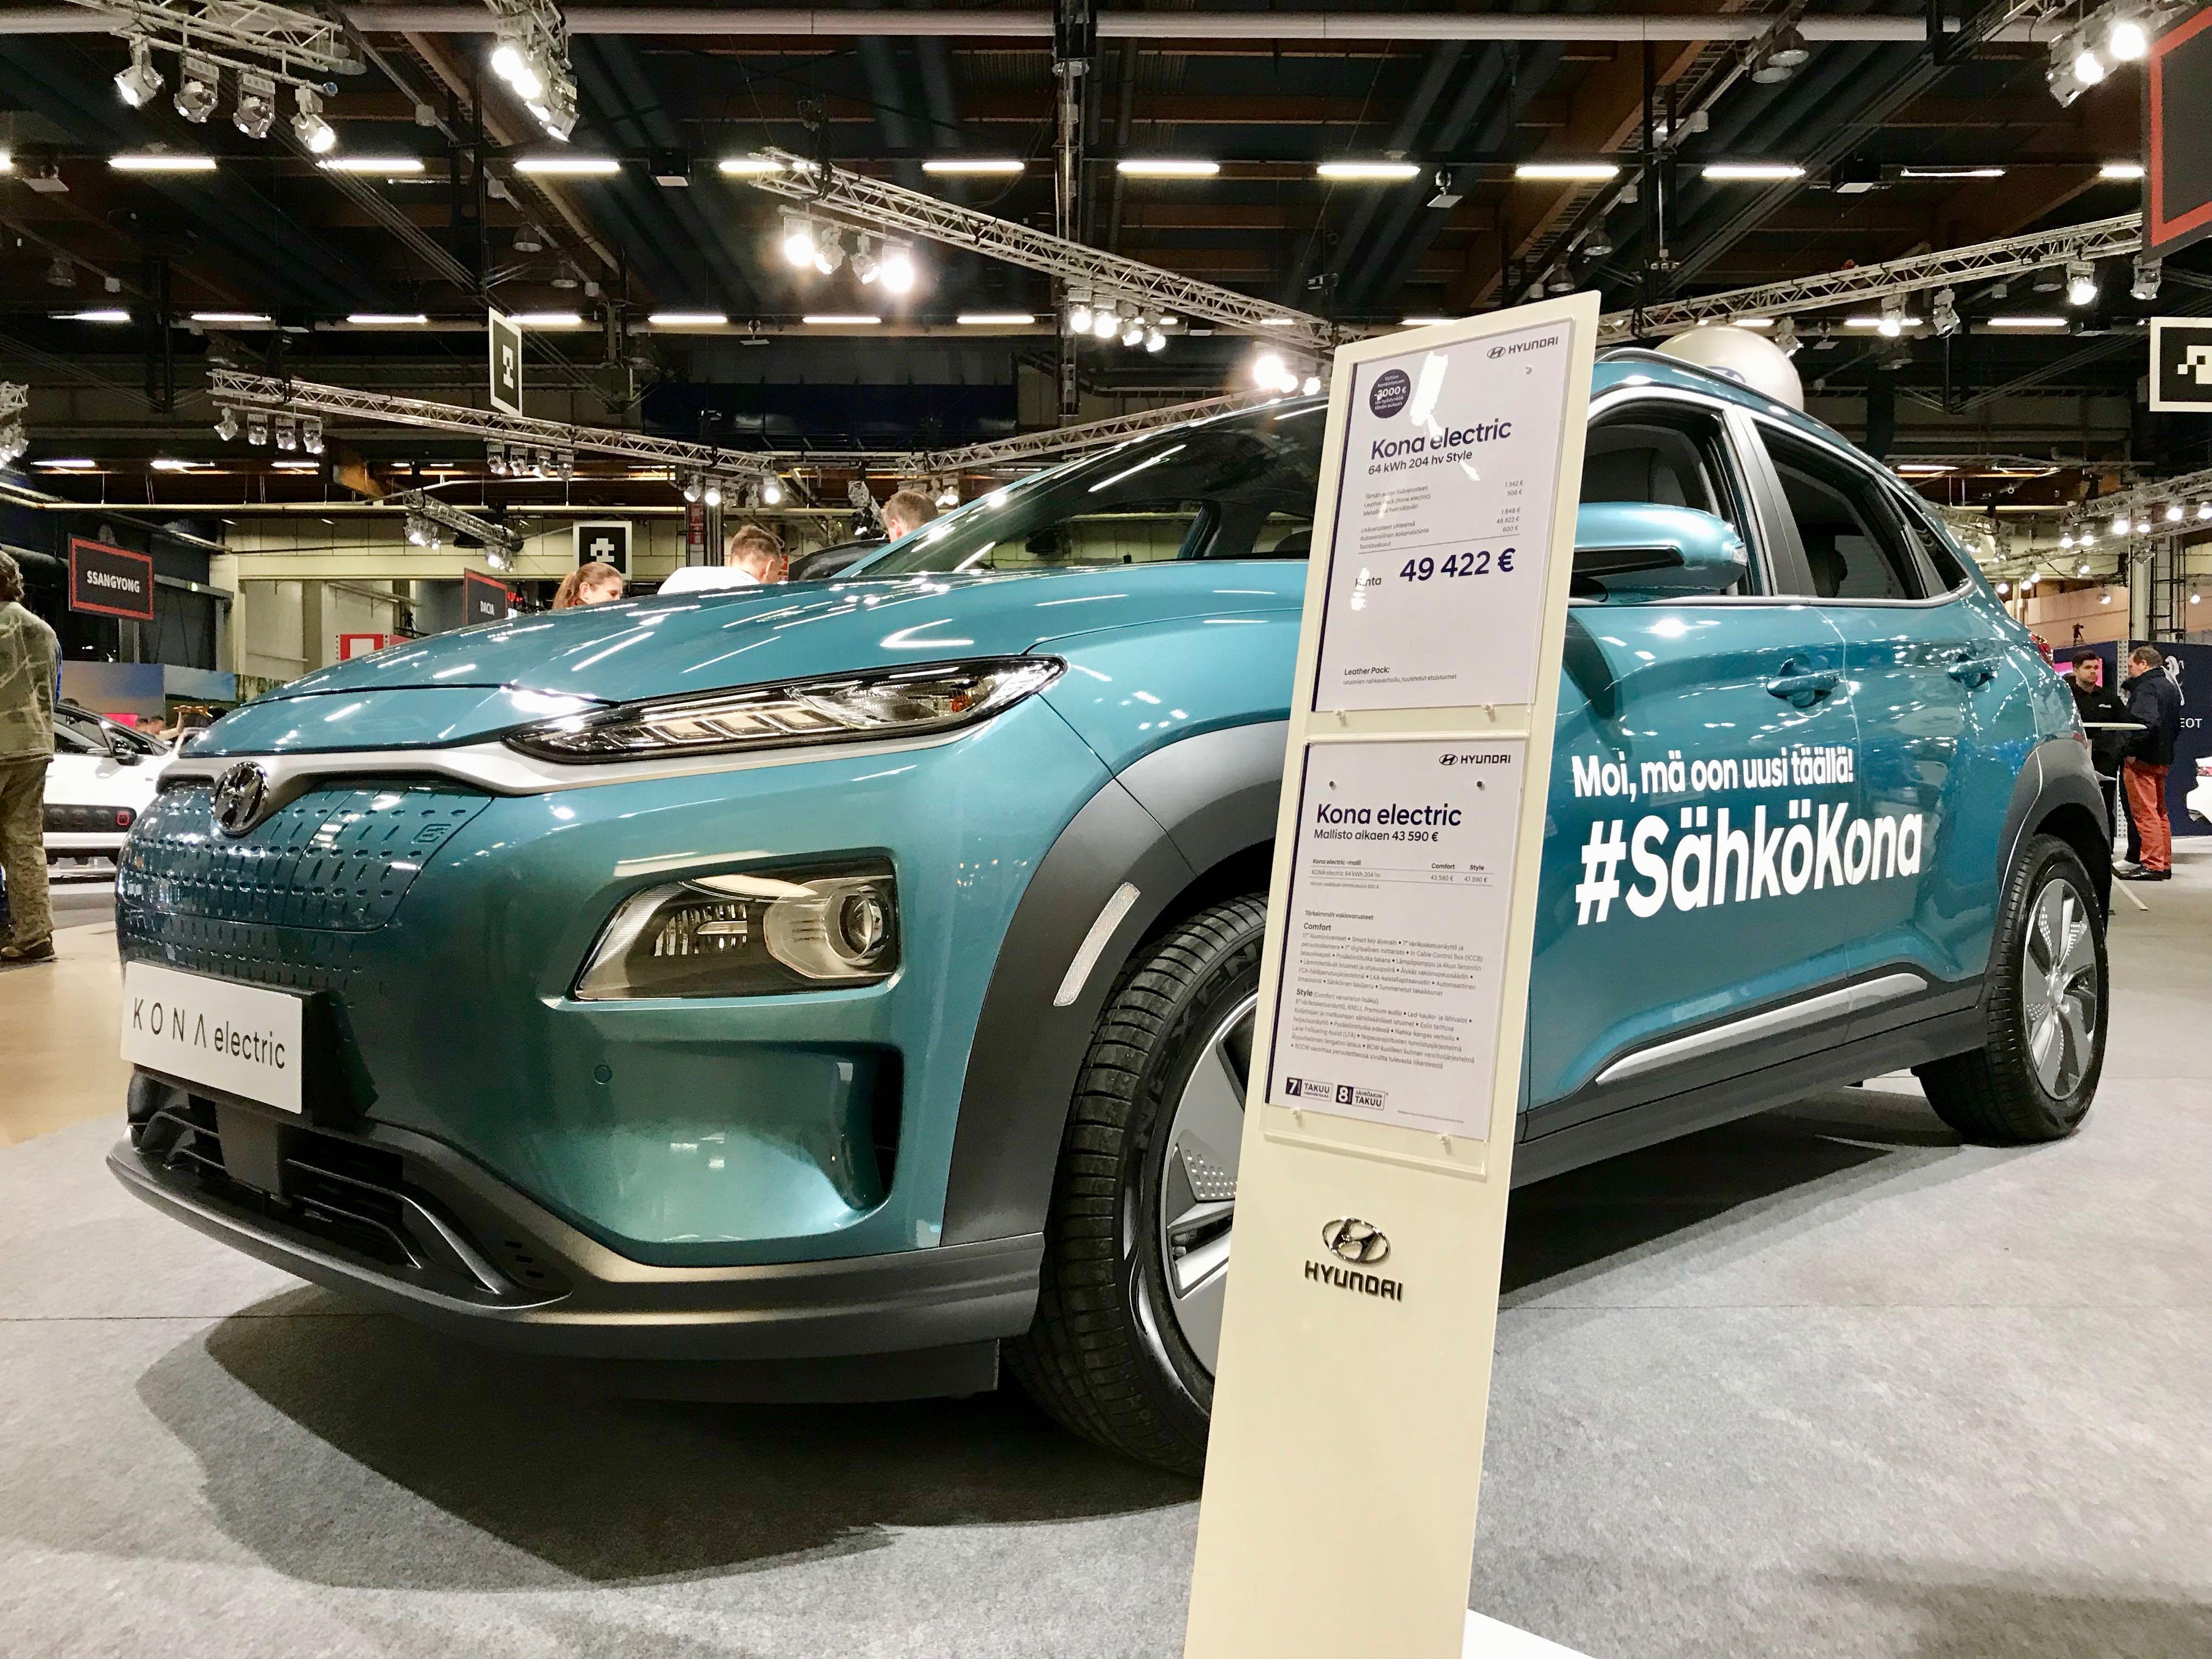 Auto 2018 -Hyundai Kona Electric